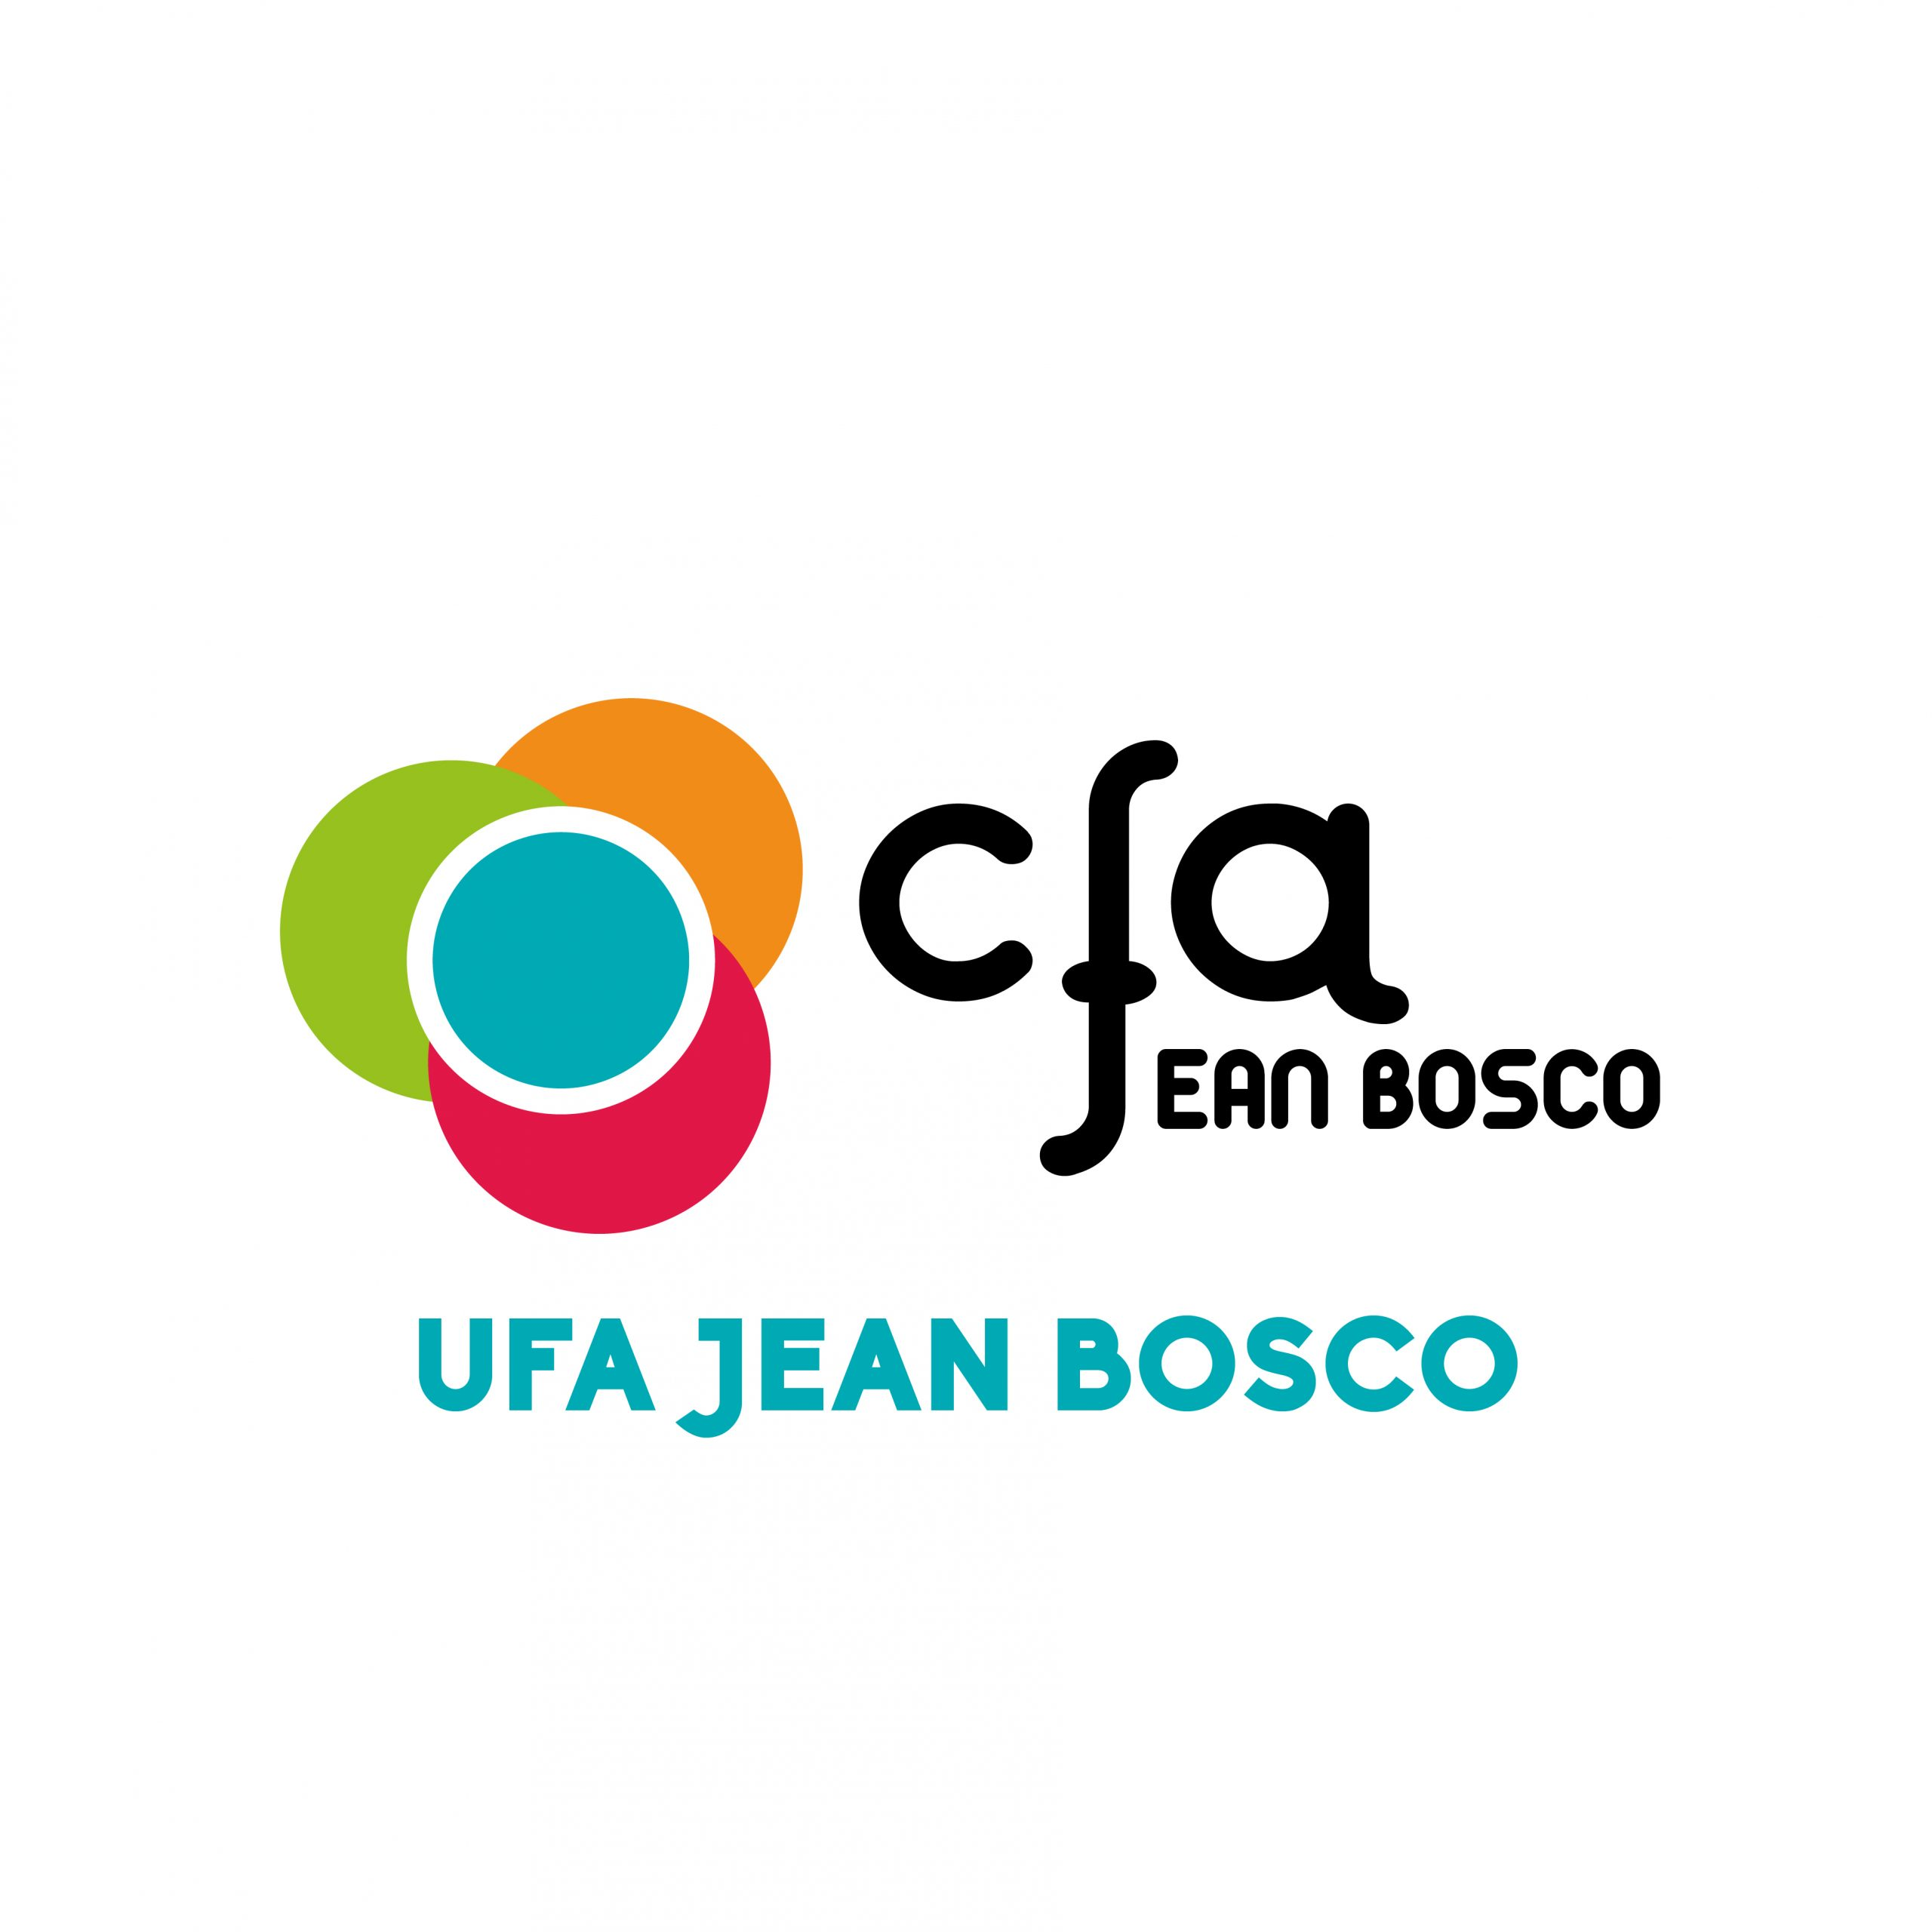 UFA JEAN BOSCO